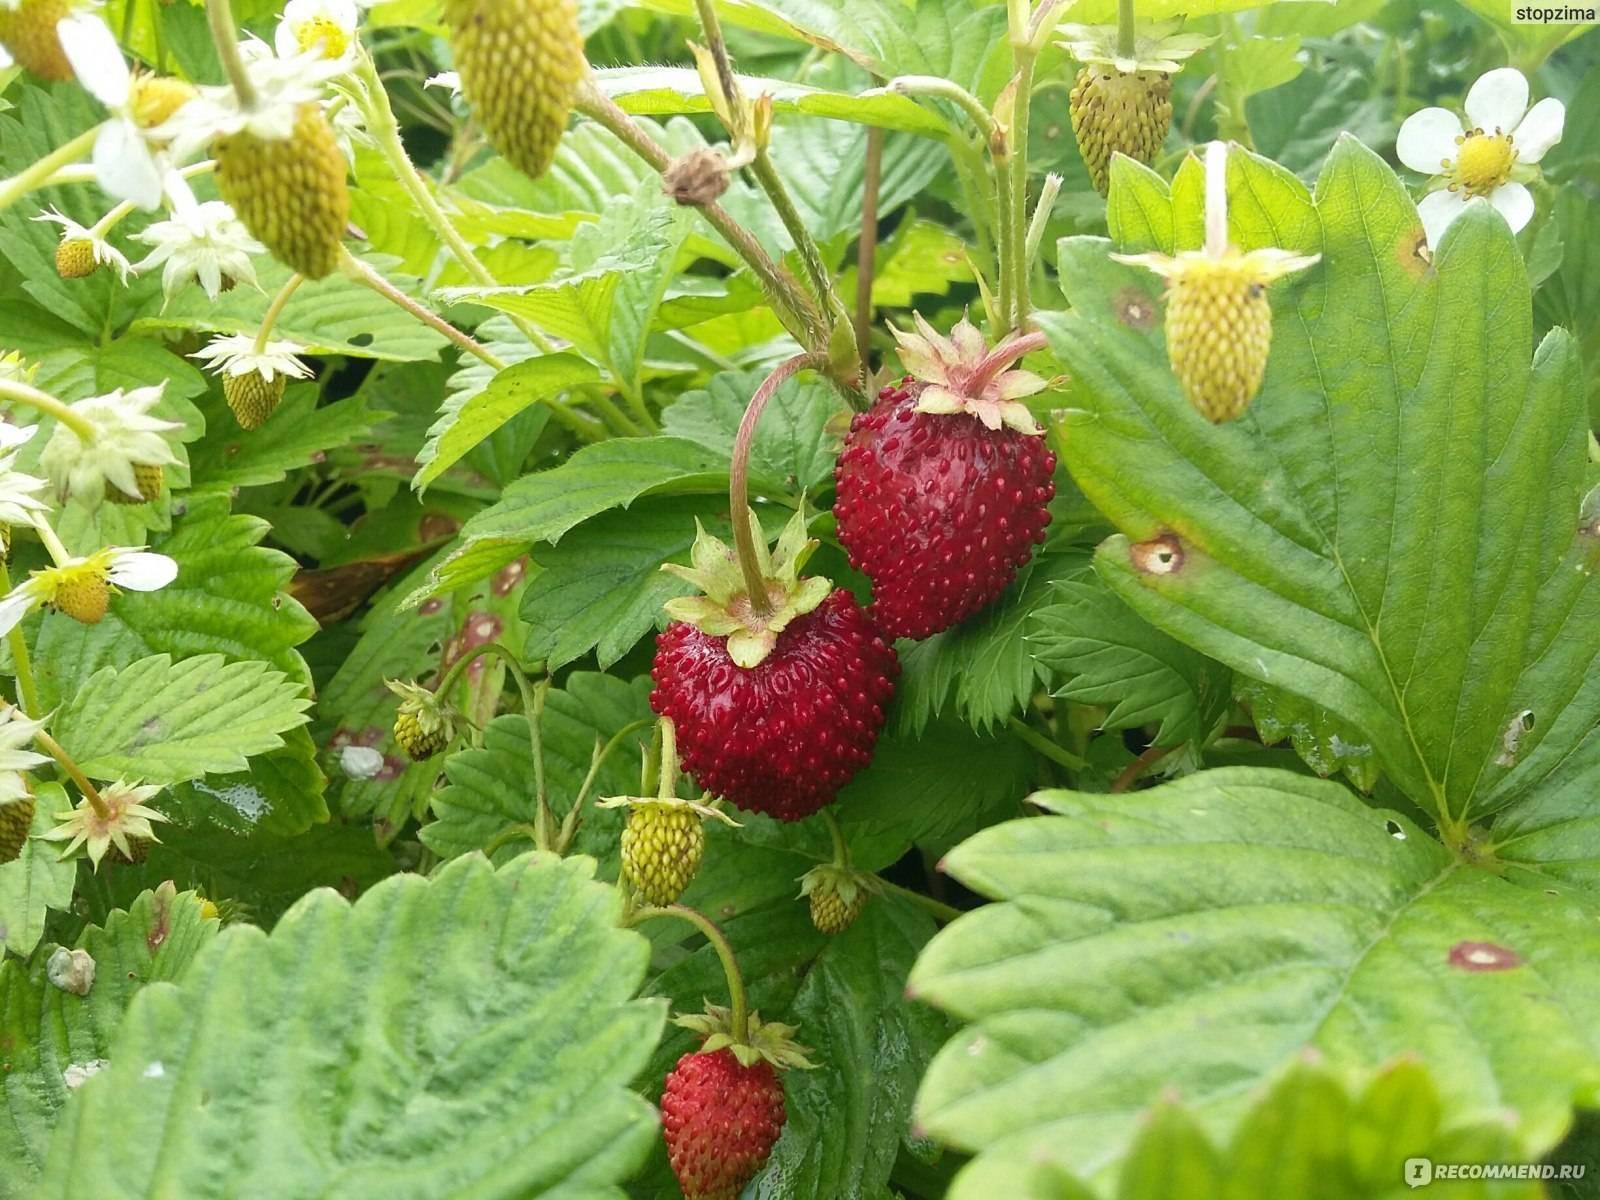 Земляника «барон солемахер»: выращивание из семян